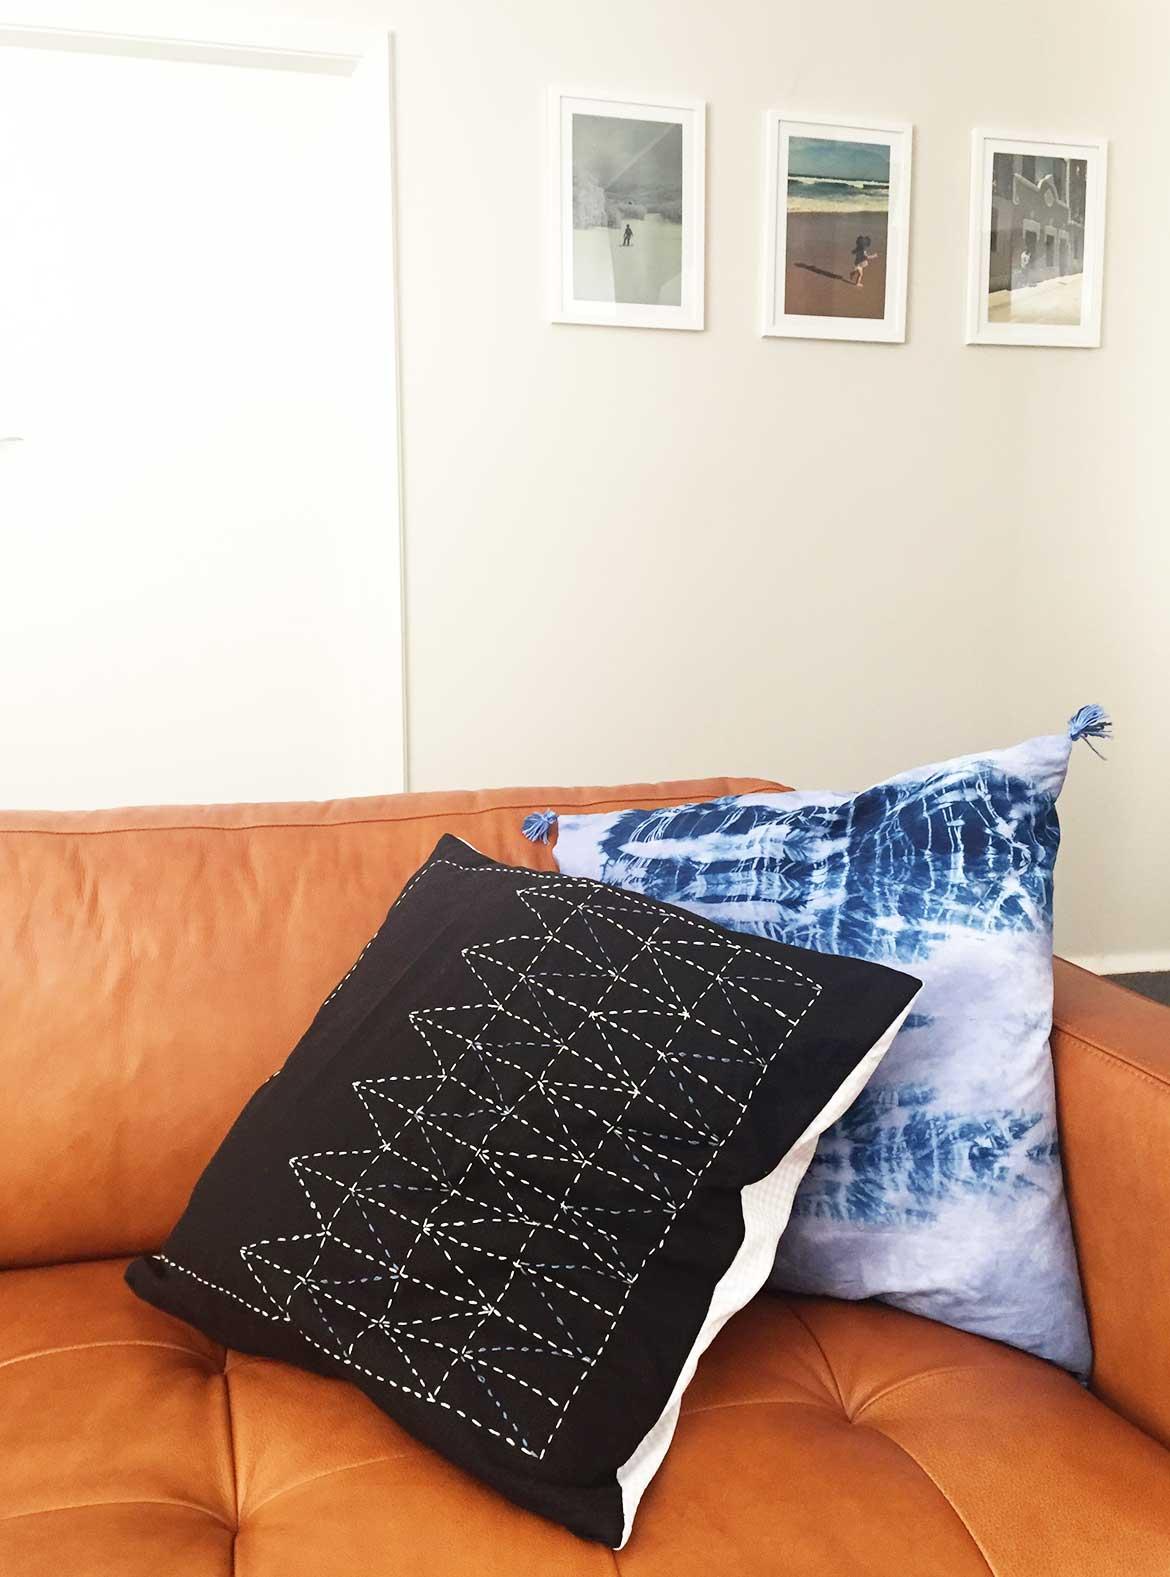 Sashiko cushion on black linen and Shibori cushion with tassels. I made both of these for my new caramel leather sofa.